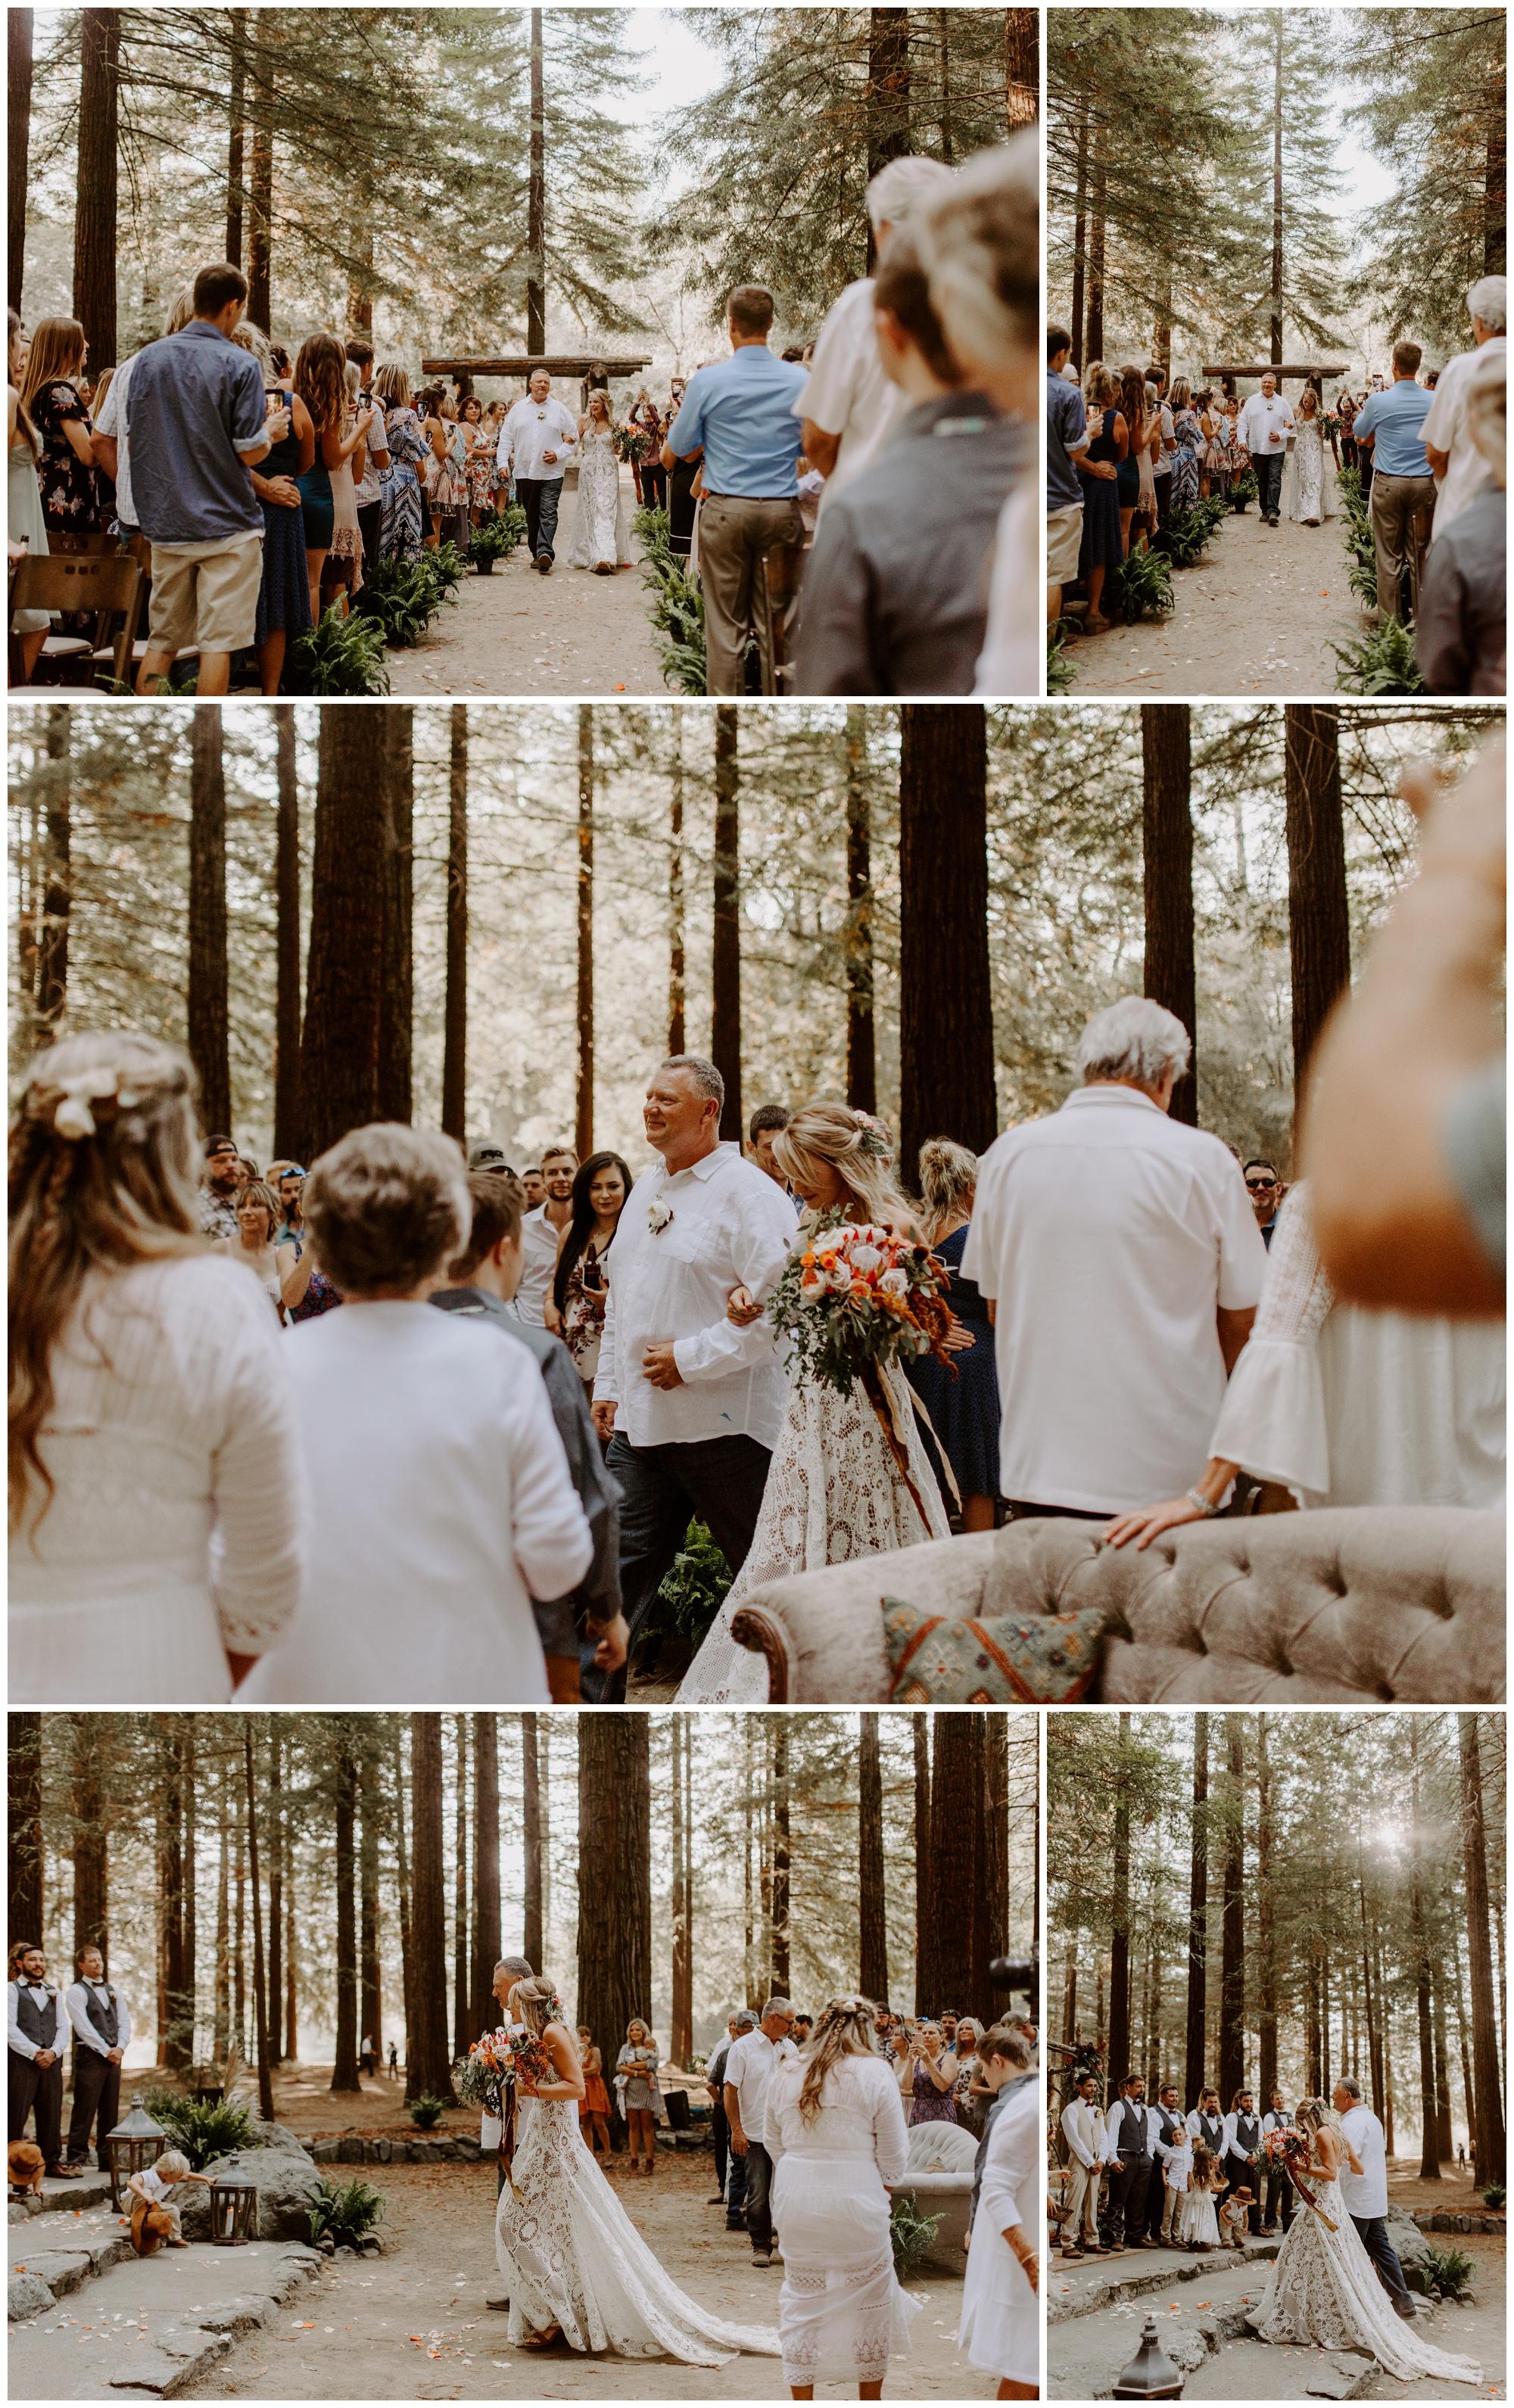 Redwood Festival Wedding Humbolt California - Jessica Heron Images_0036.jpg